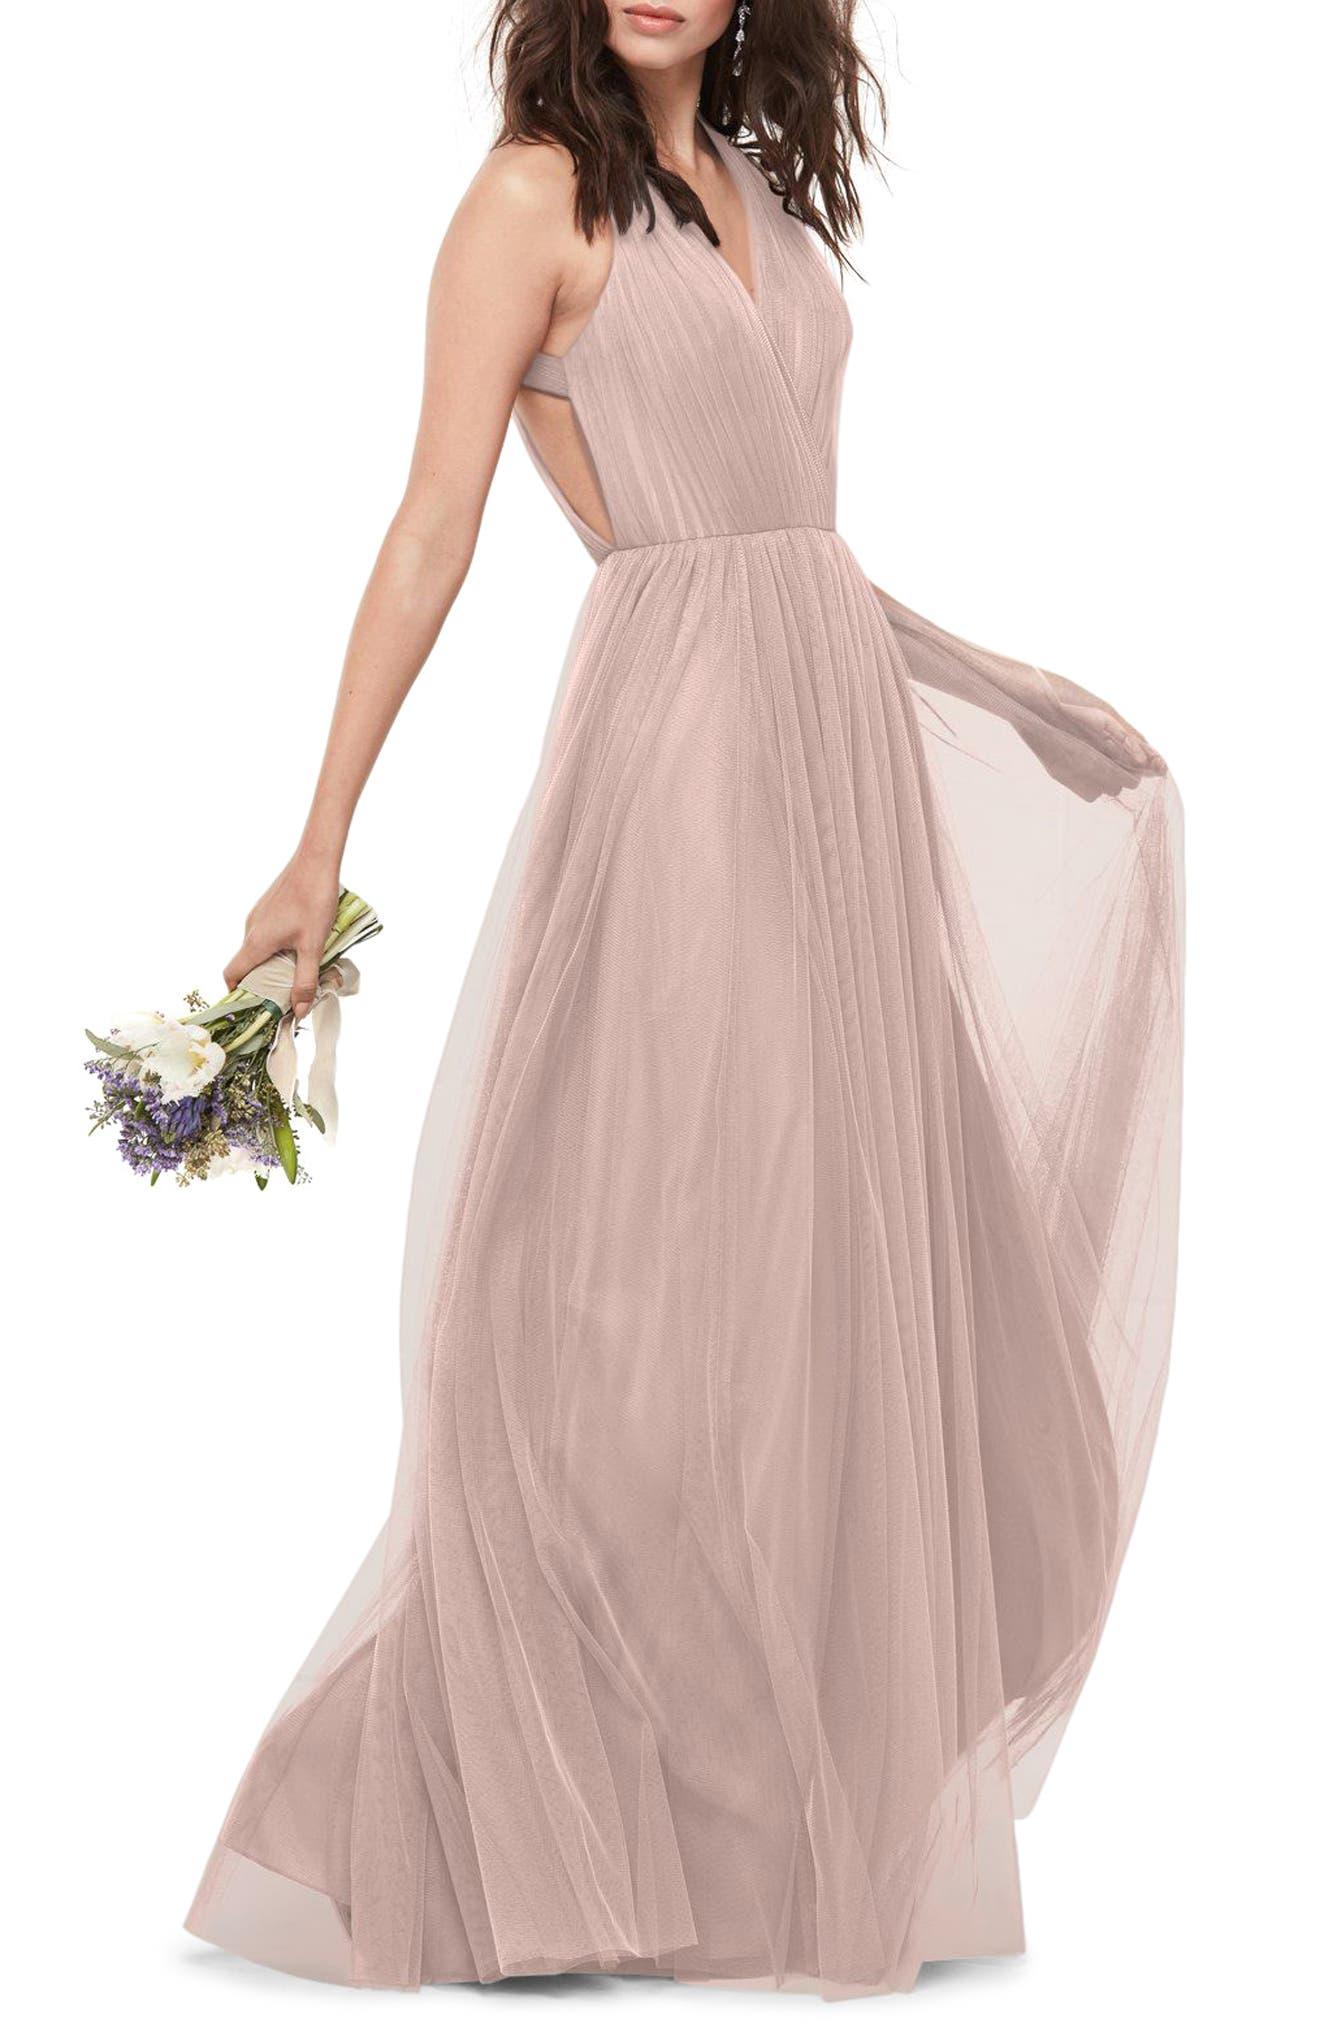 Bridesmaid wedding party dresses nordstrom wtoo bobbinet halter gown ombrellifo Images